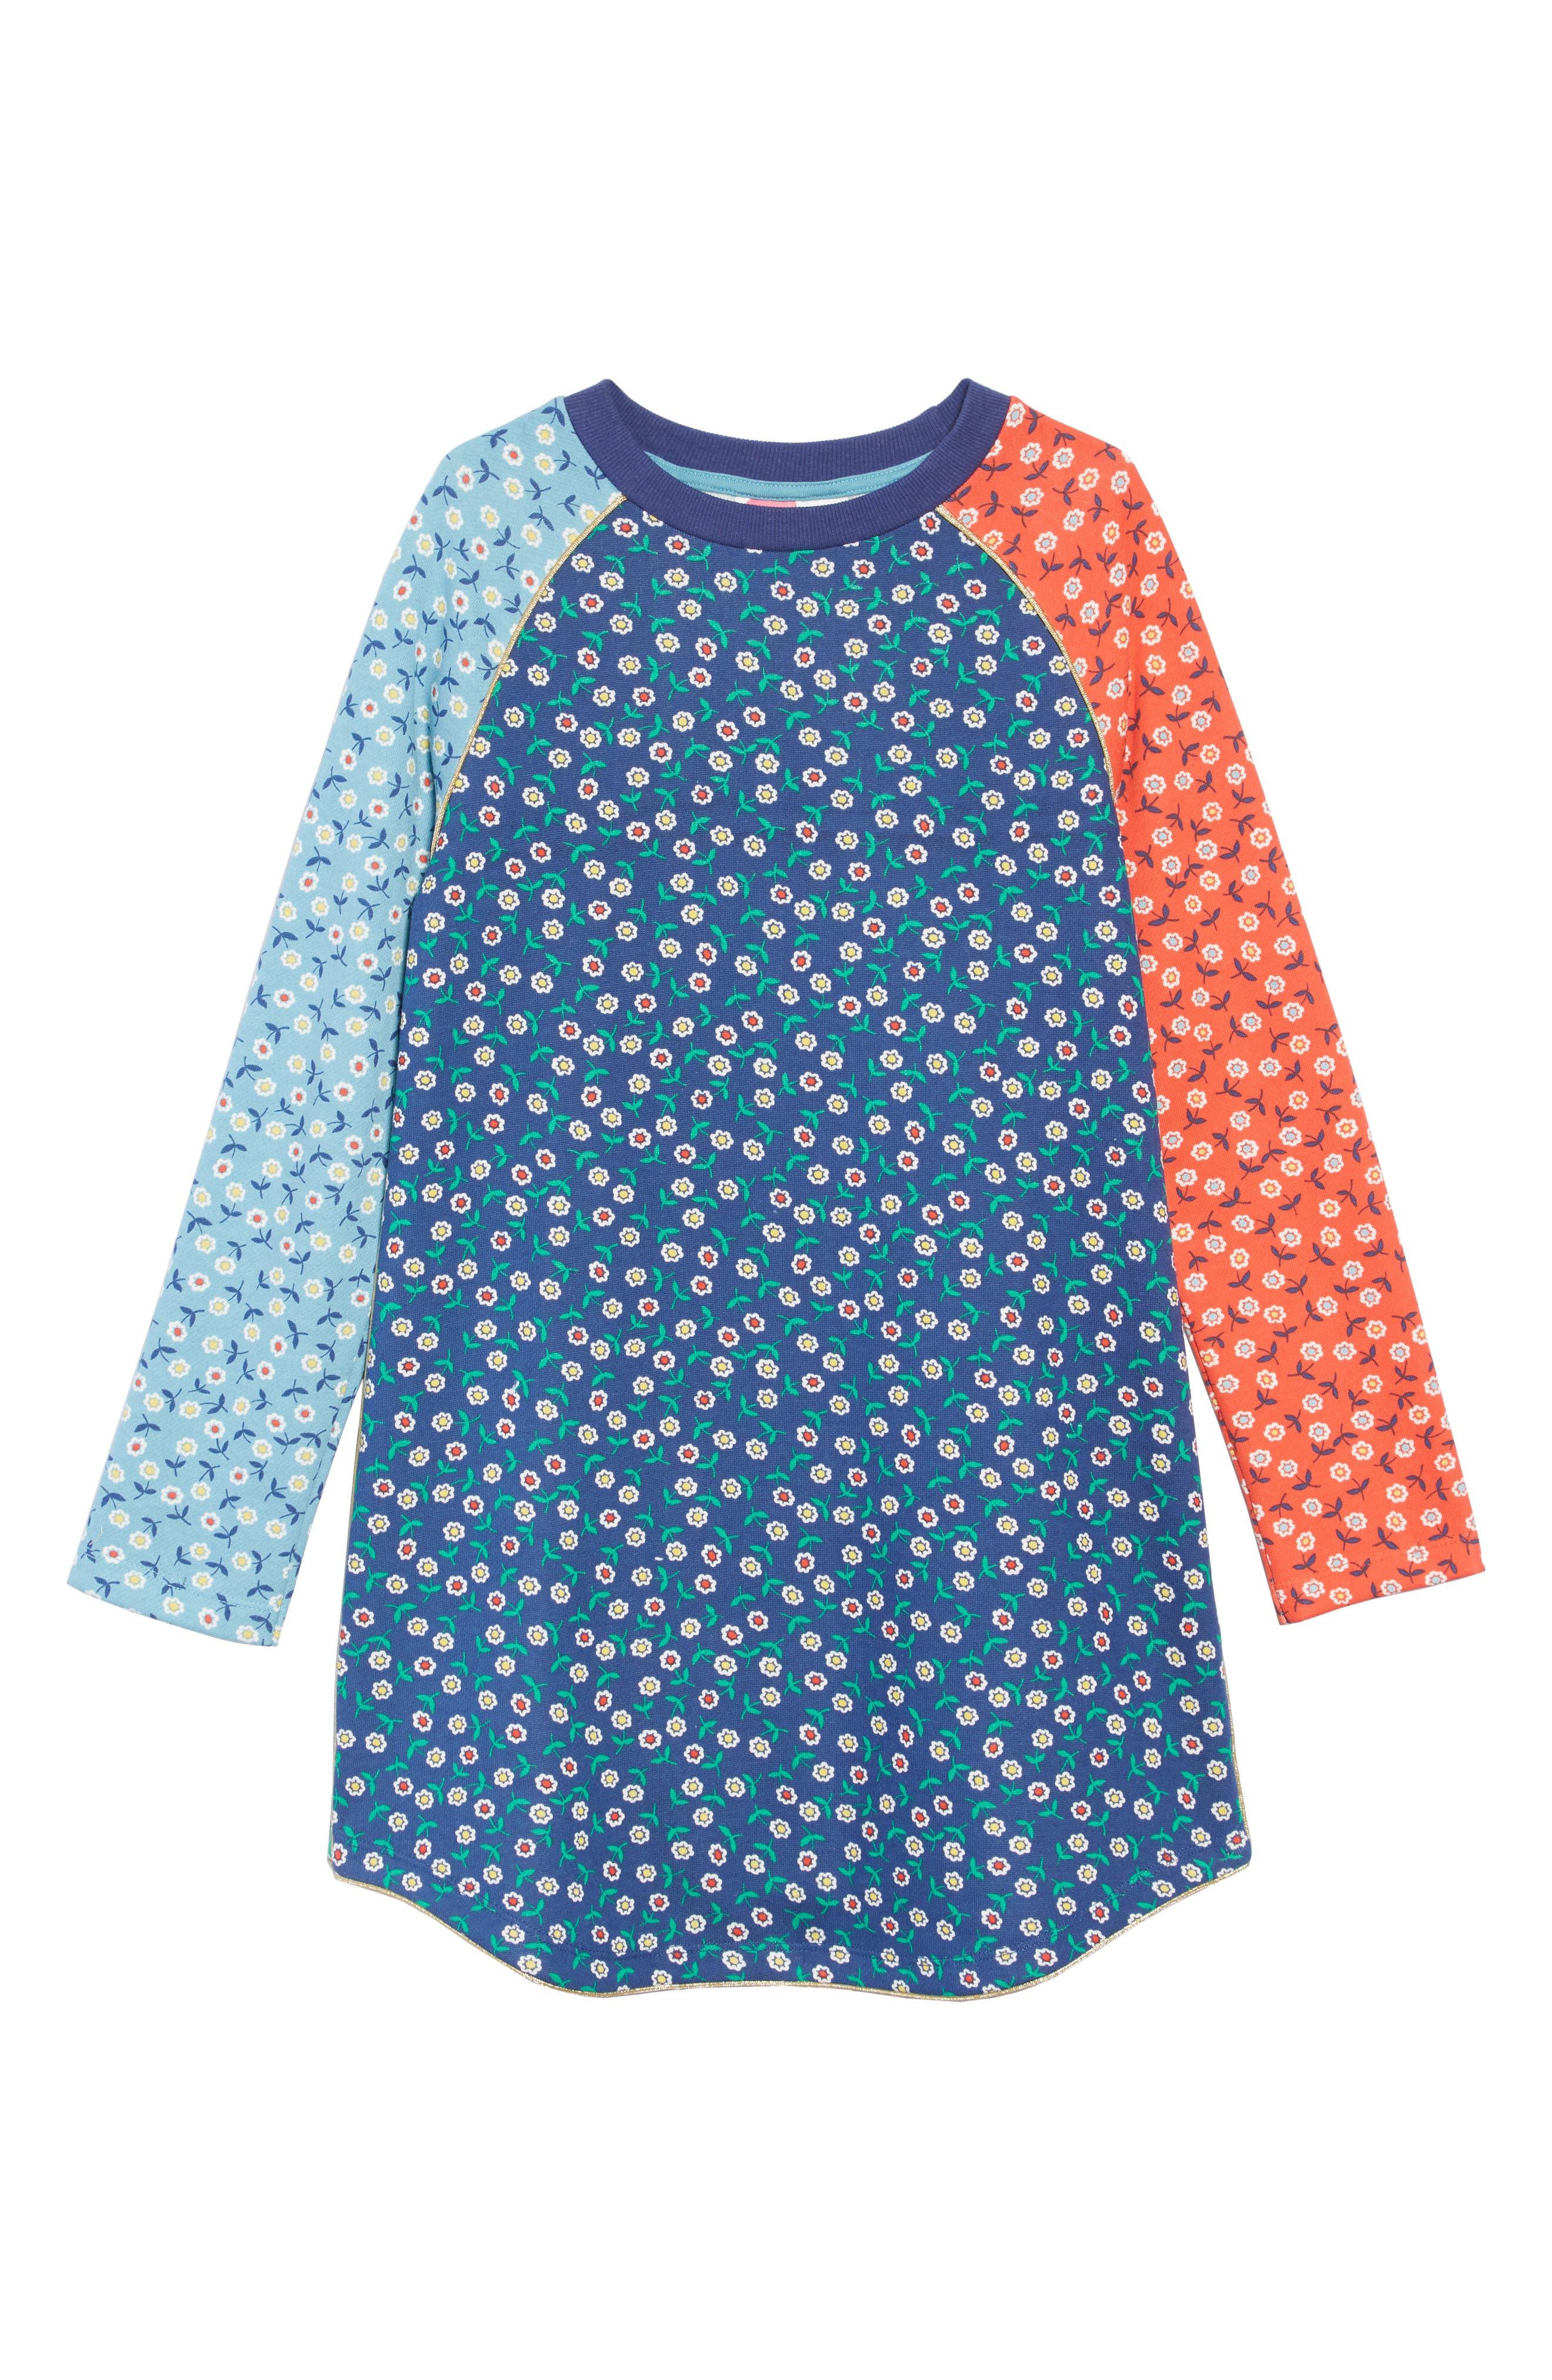 Cozy Sweatshirt Dress,                         Main,                         color, Multi Retro Daisies